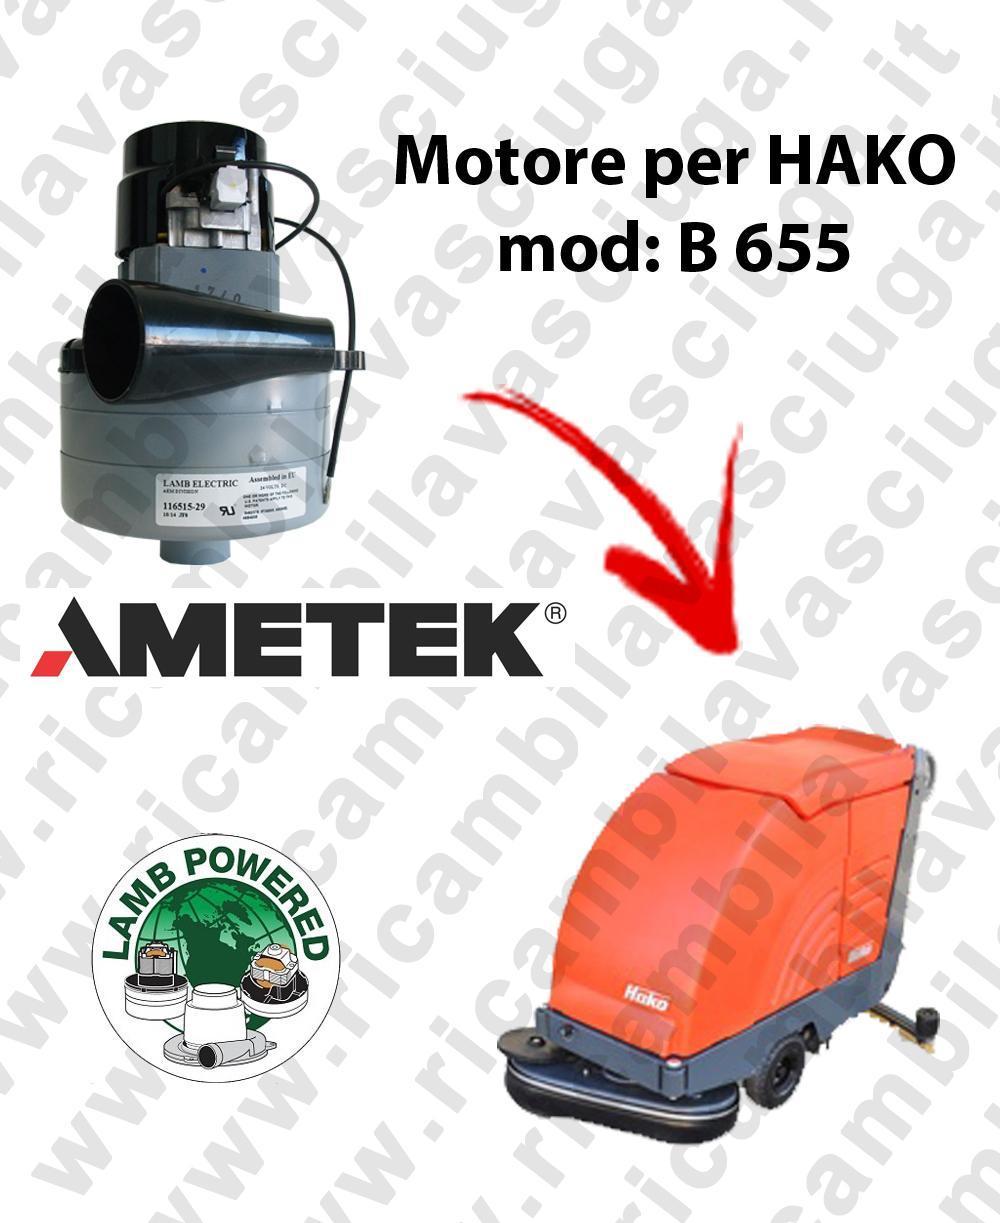 B 655 Motore de aspiración LAMB AMETEK para fregadora HAKO